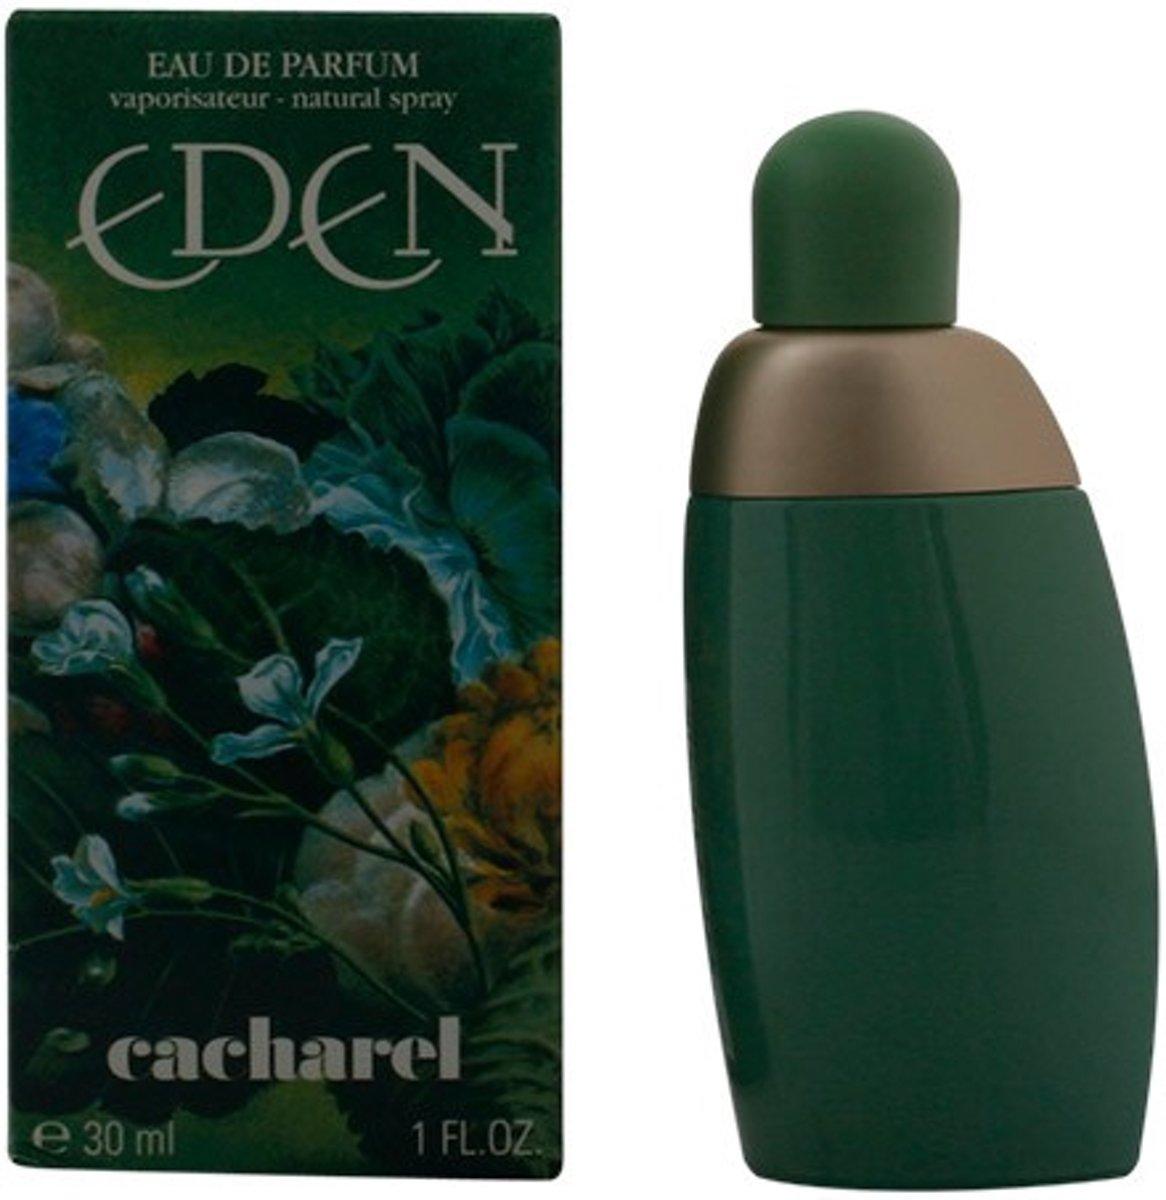 | Cacharel EDEN eau de parfum spray 30 ml